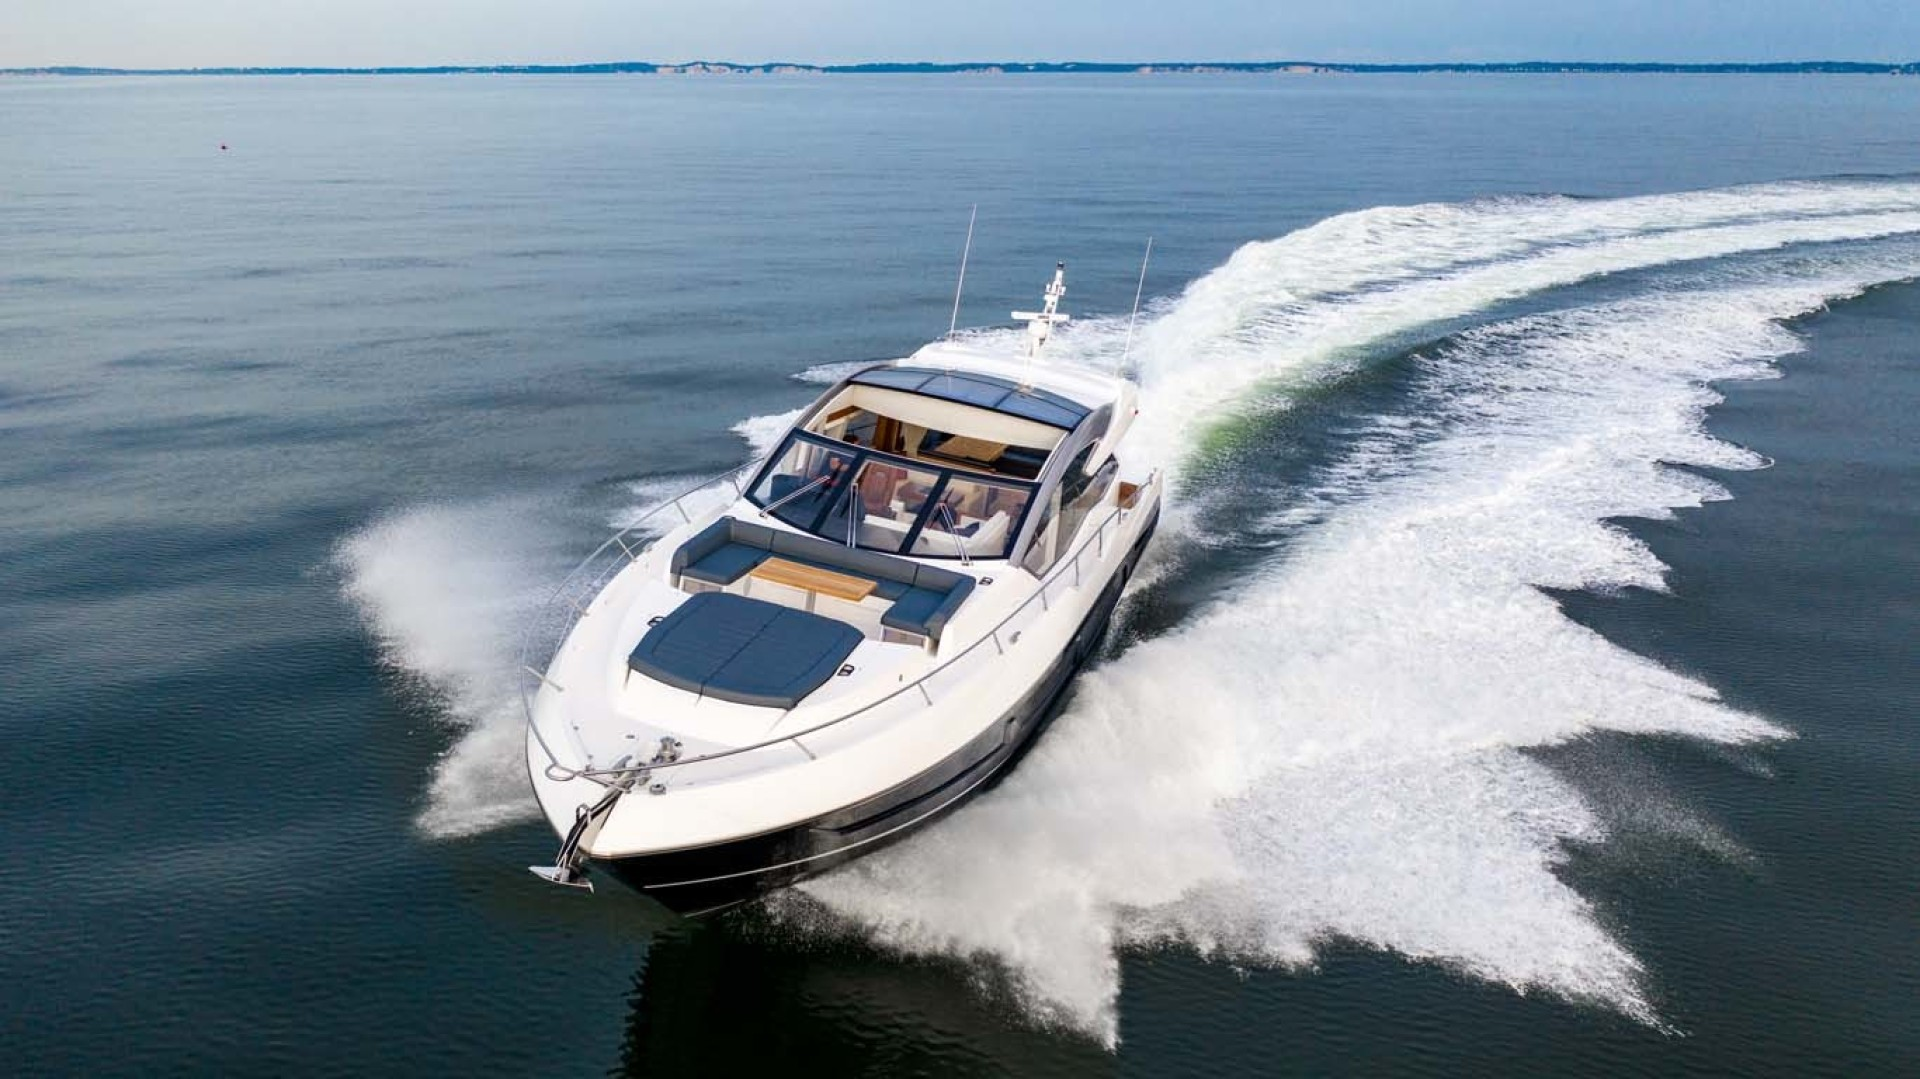 Sunseeker-Predator 2020-WIND@SEA Ft. Lauderdale-Florida-United States Profile-1457458 | Thumbnail